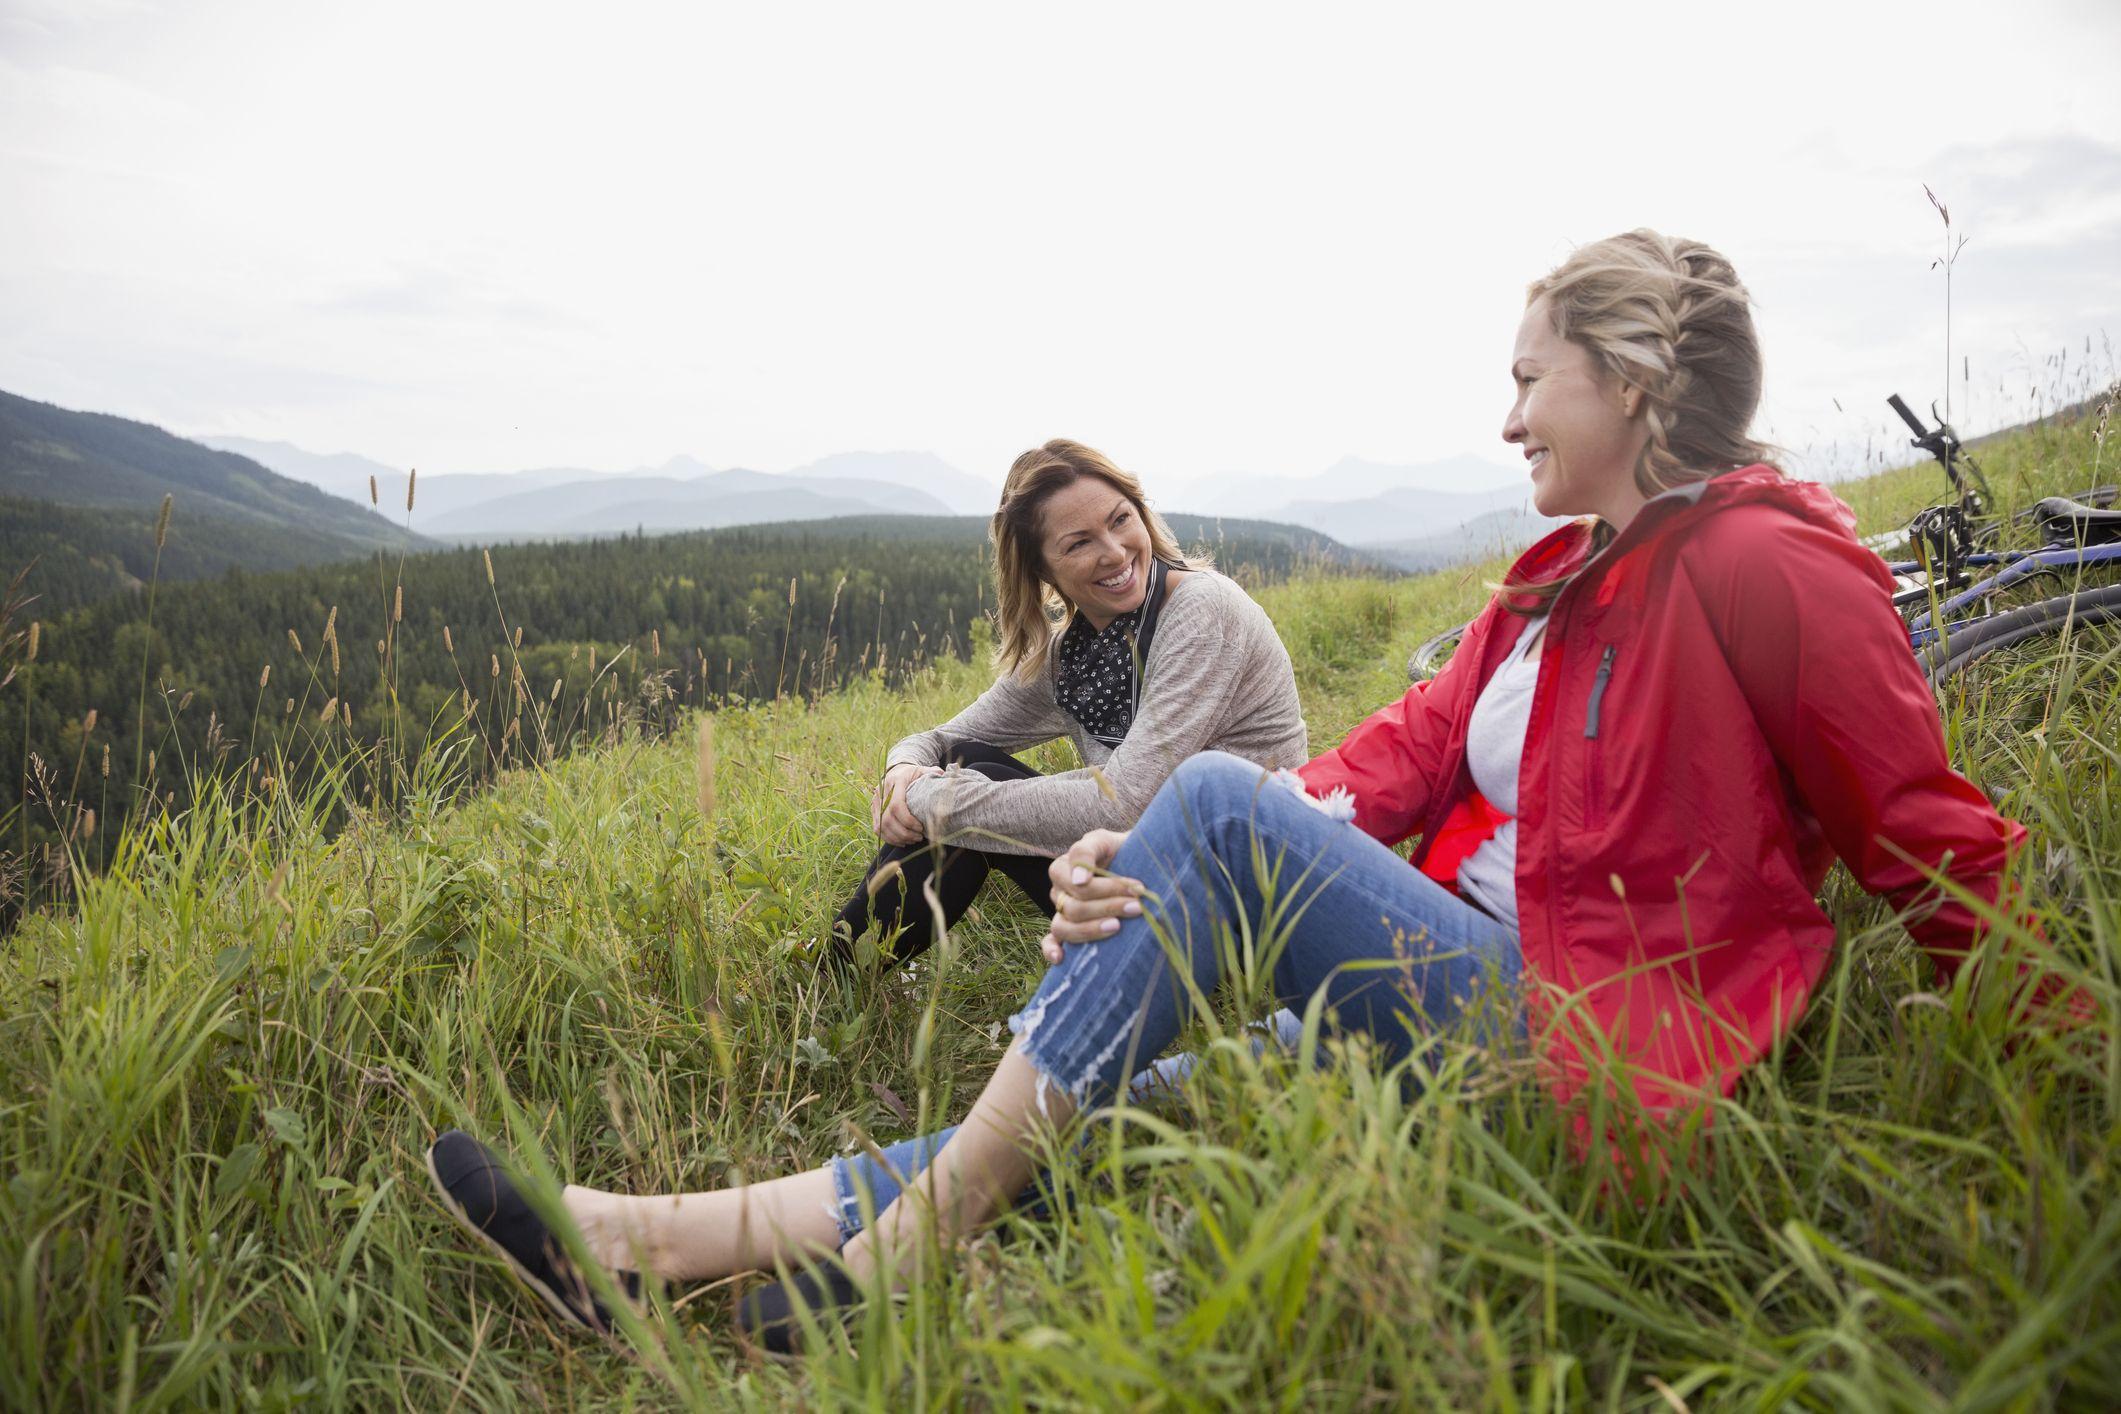 Female friends relaxing in grass in remote rural field